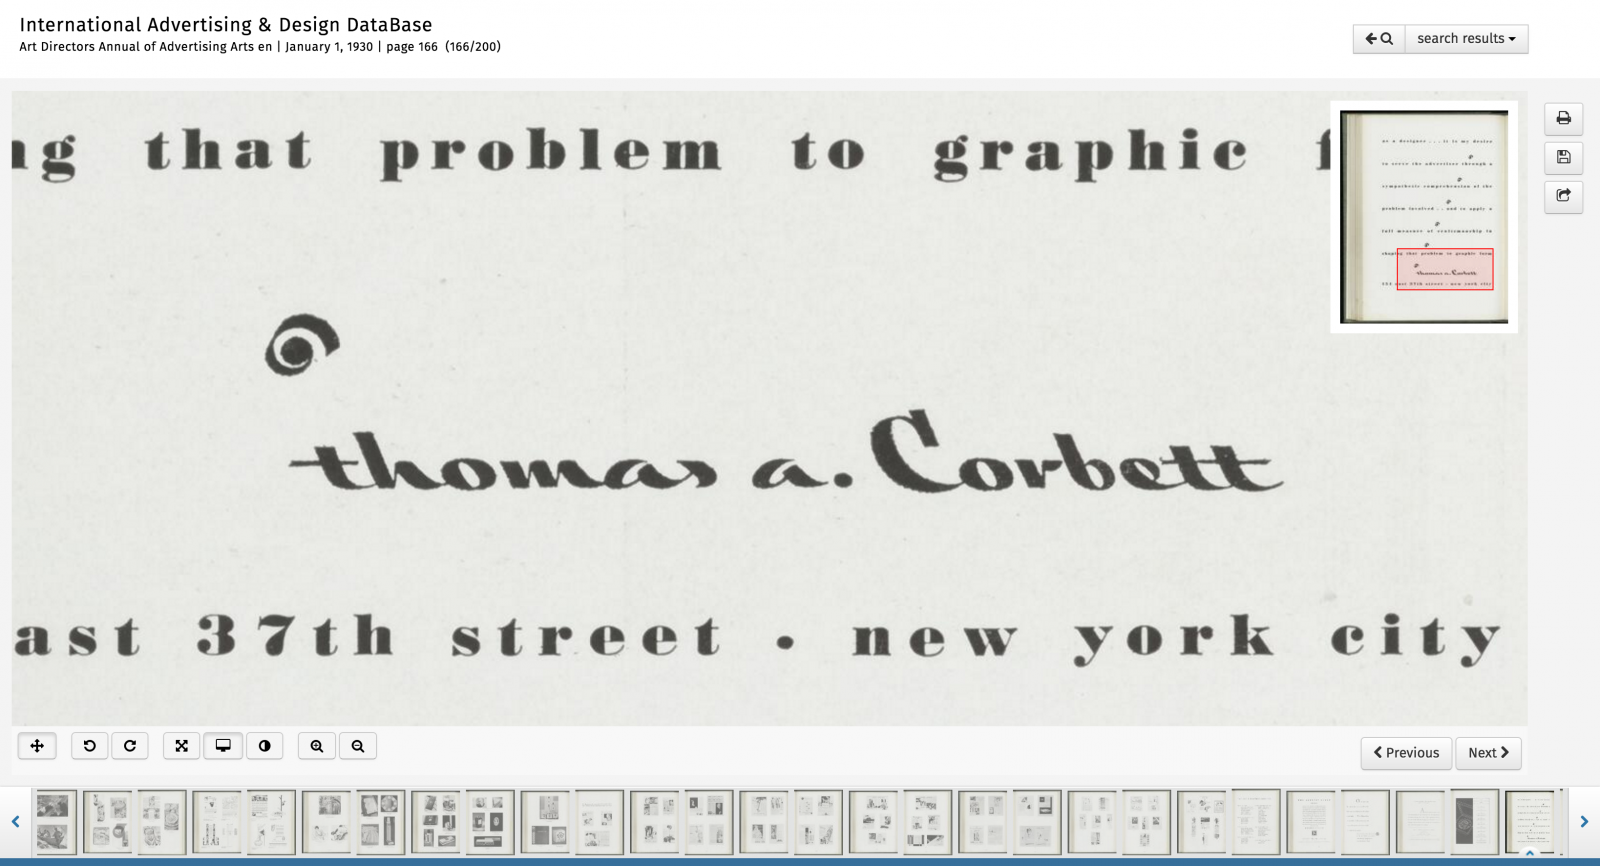 Thomas A. Corbett ad